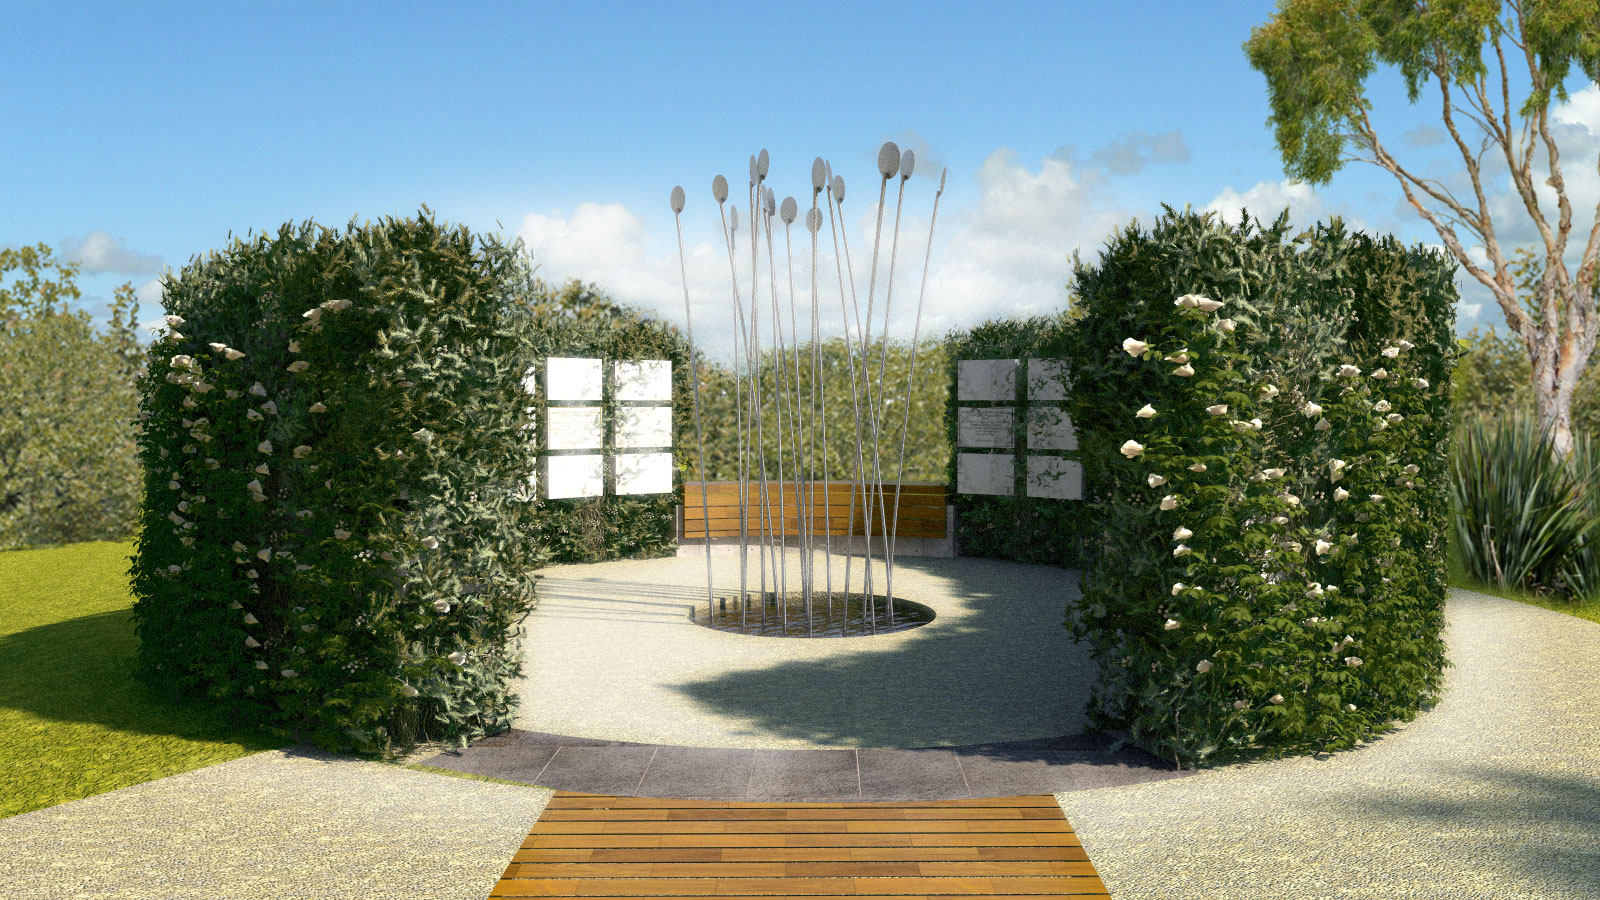 Sensory Gardens & Memorials Columbaria Green Wall Chimes Sculpture Peaceful Haven Architectural Render – Gardner Wetherill GW 4